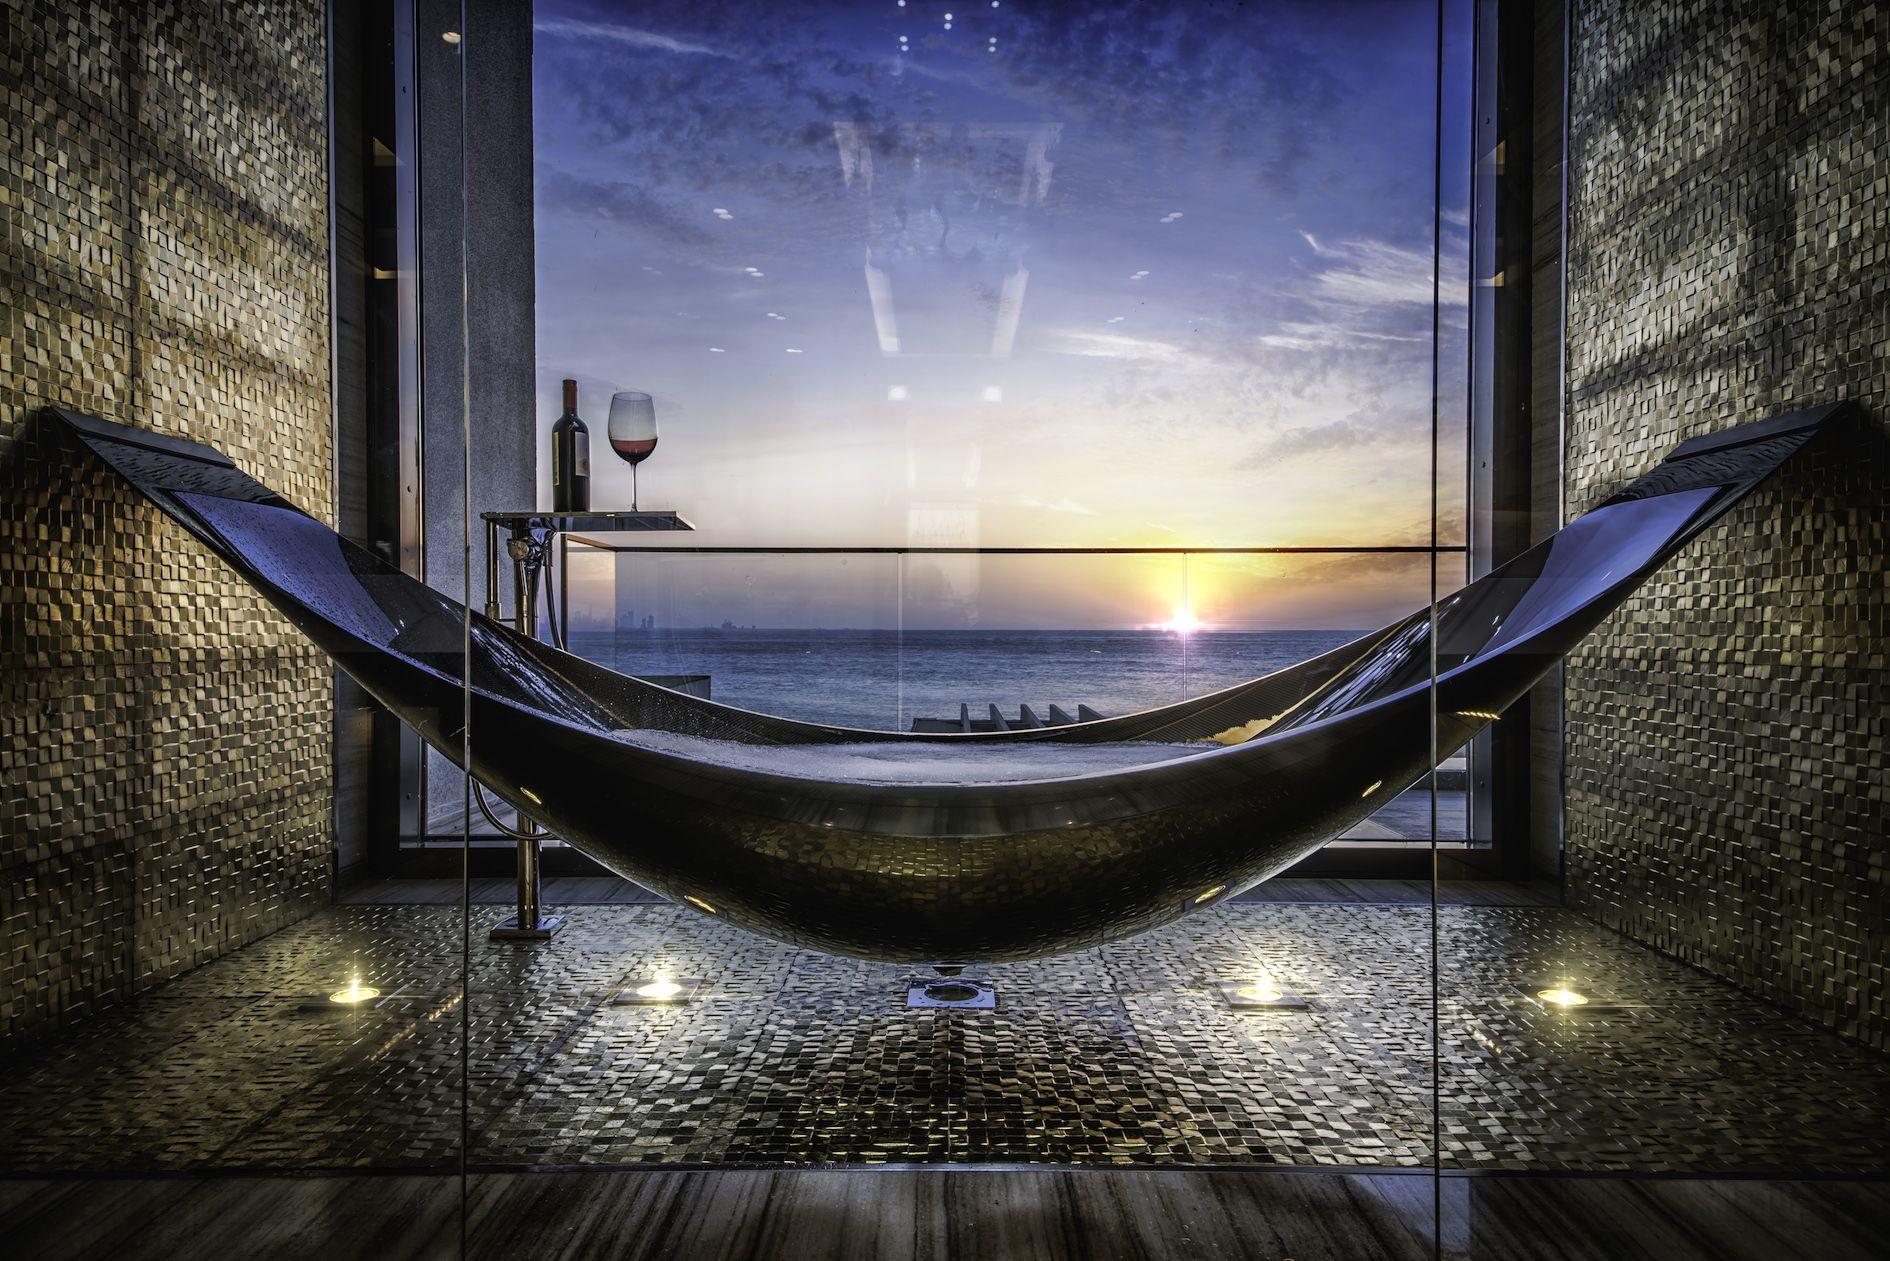 The Splinter Works Hammock Bathtub Is The Coolest Tub You\'ll Ever See